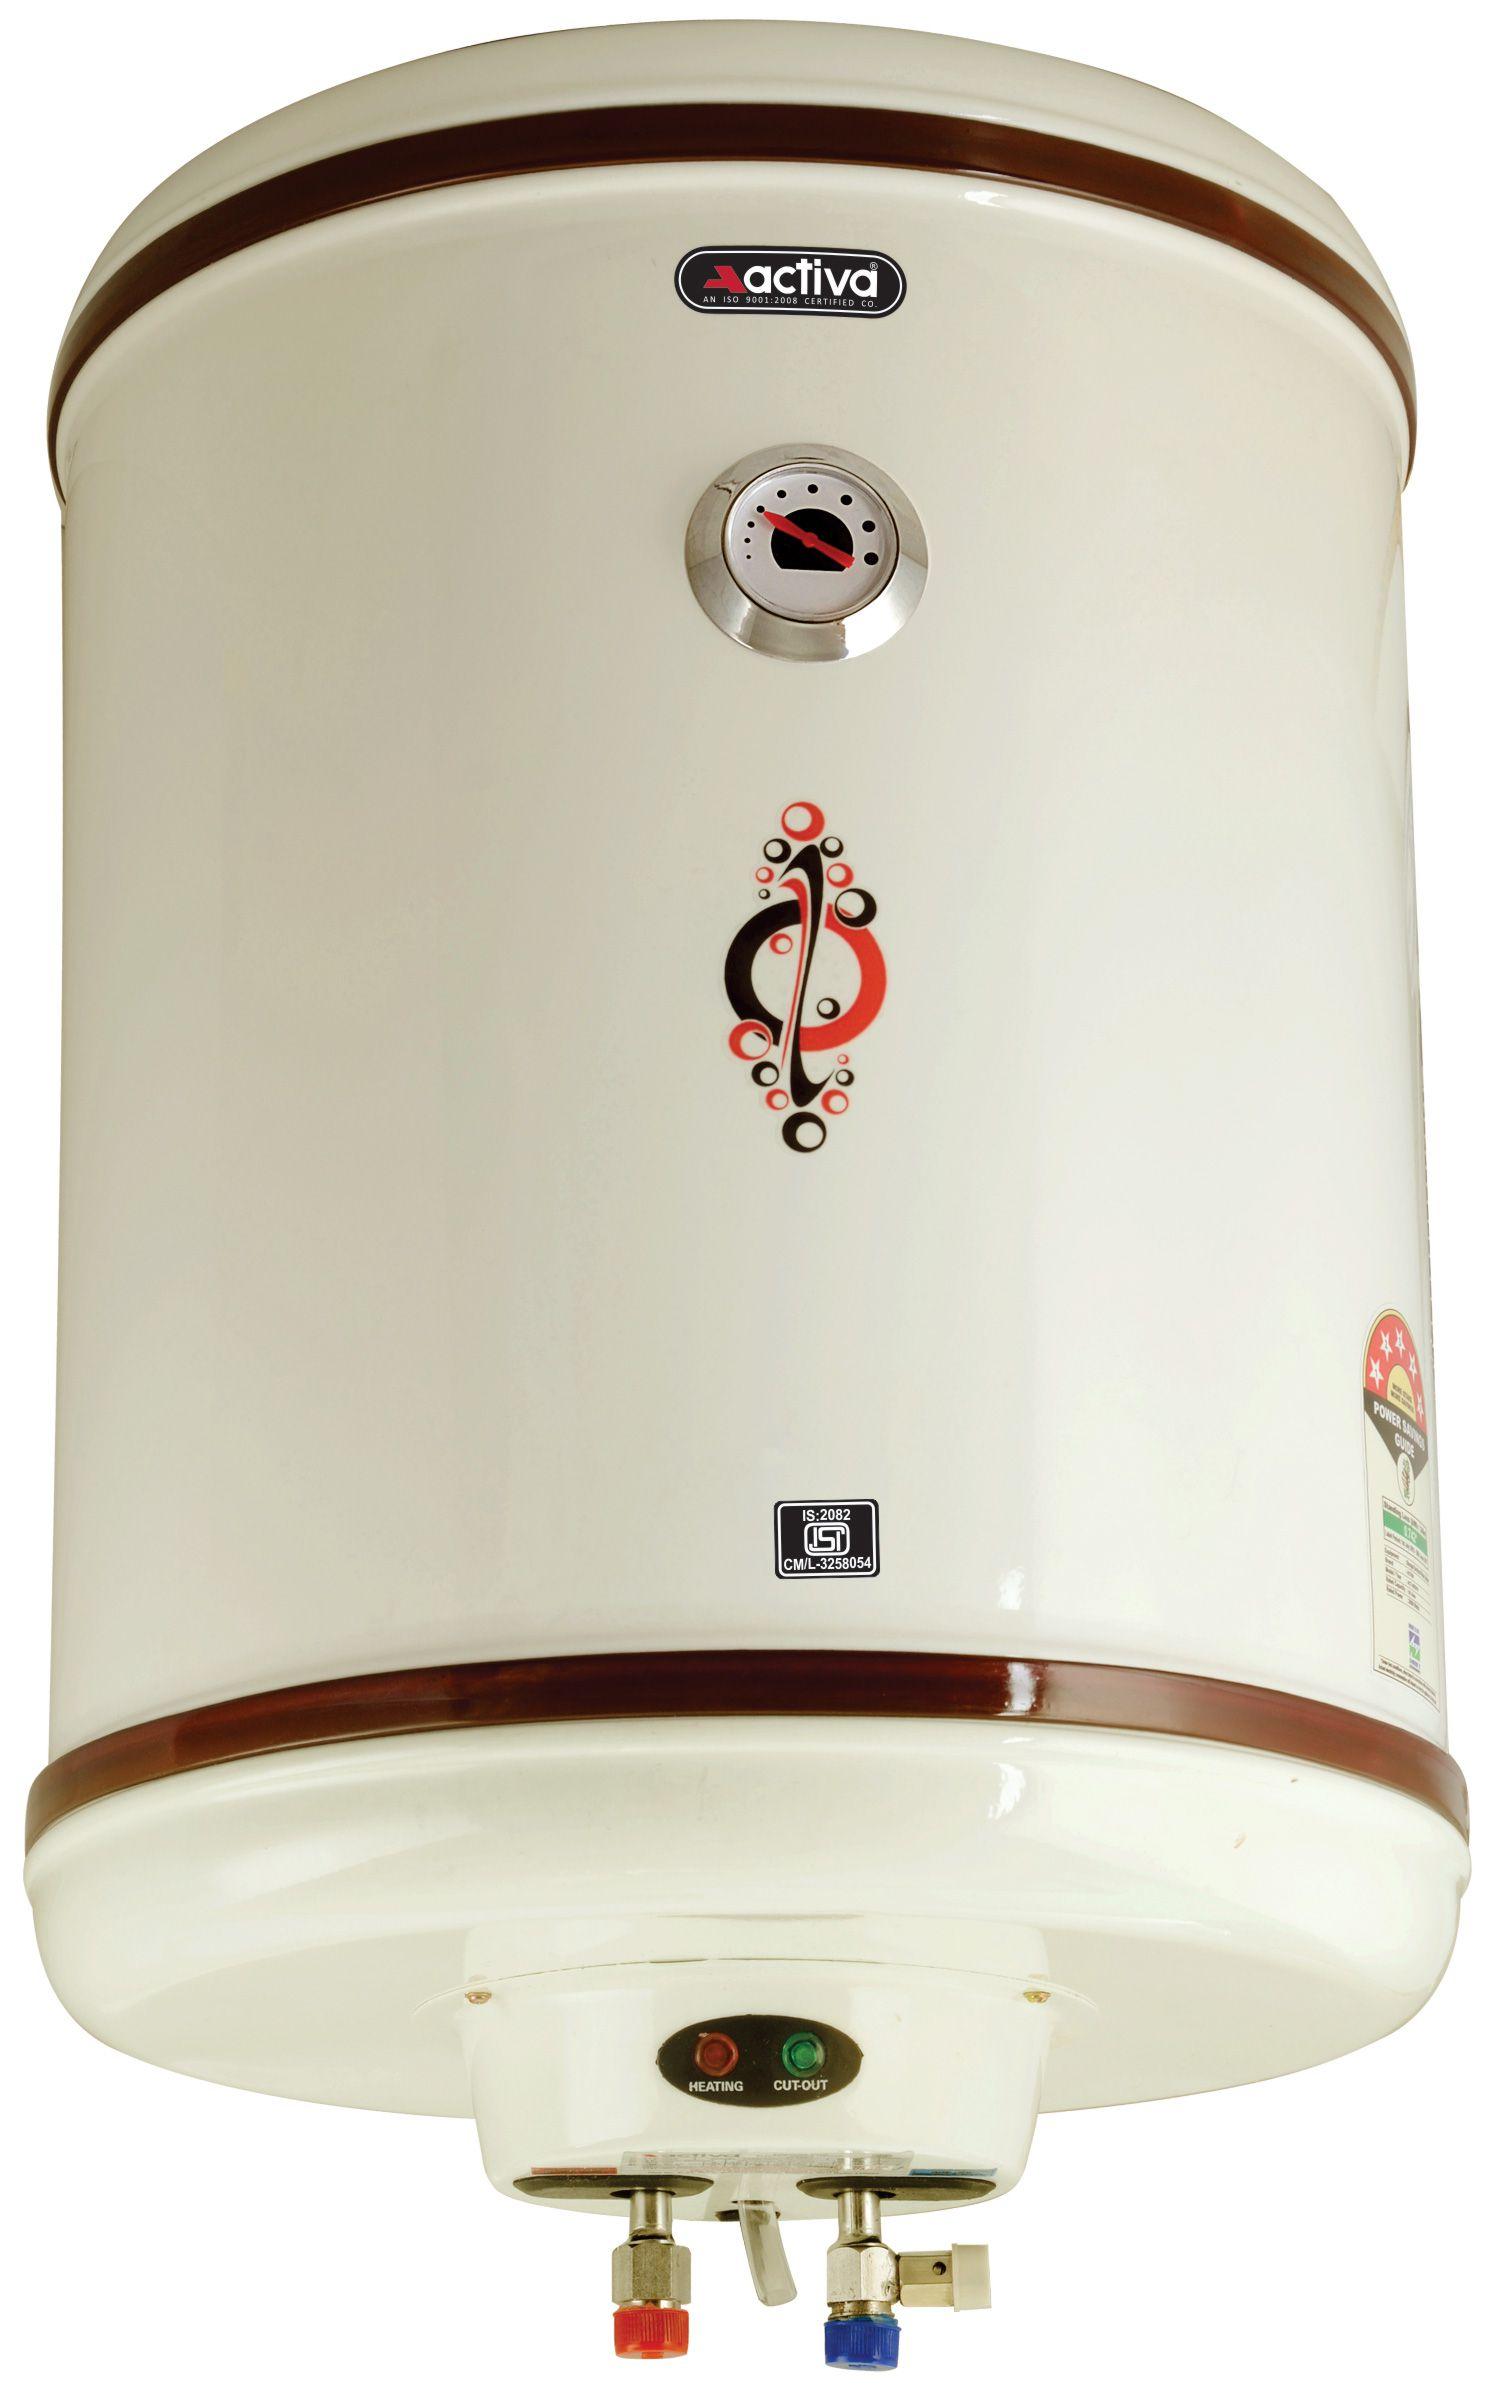 Activa 50 Ltr Water heater HOTLINE IVORY